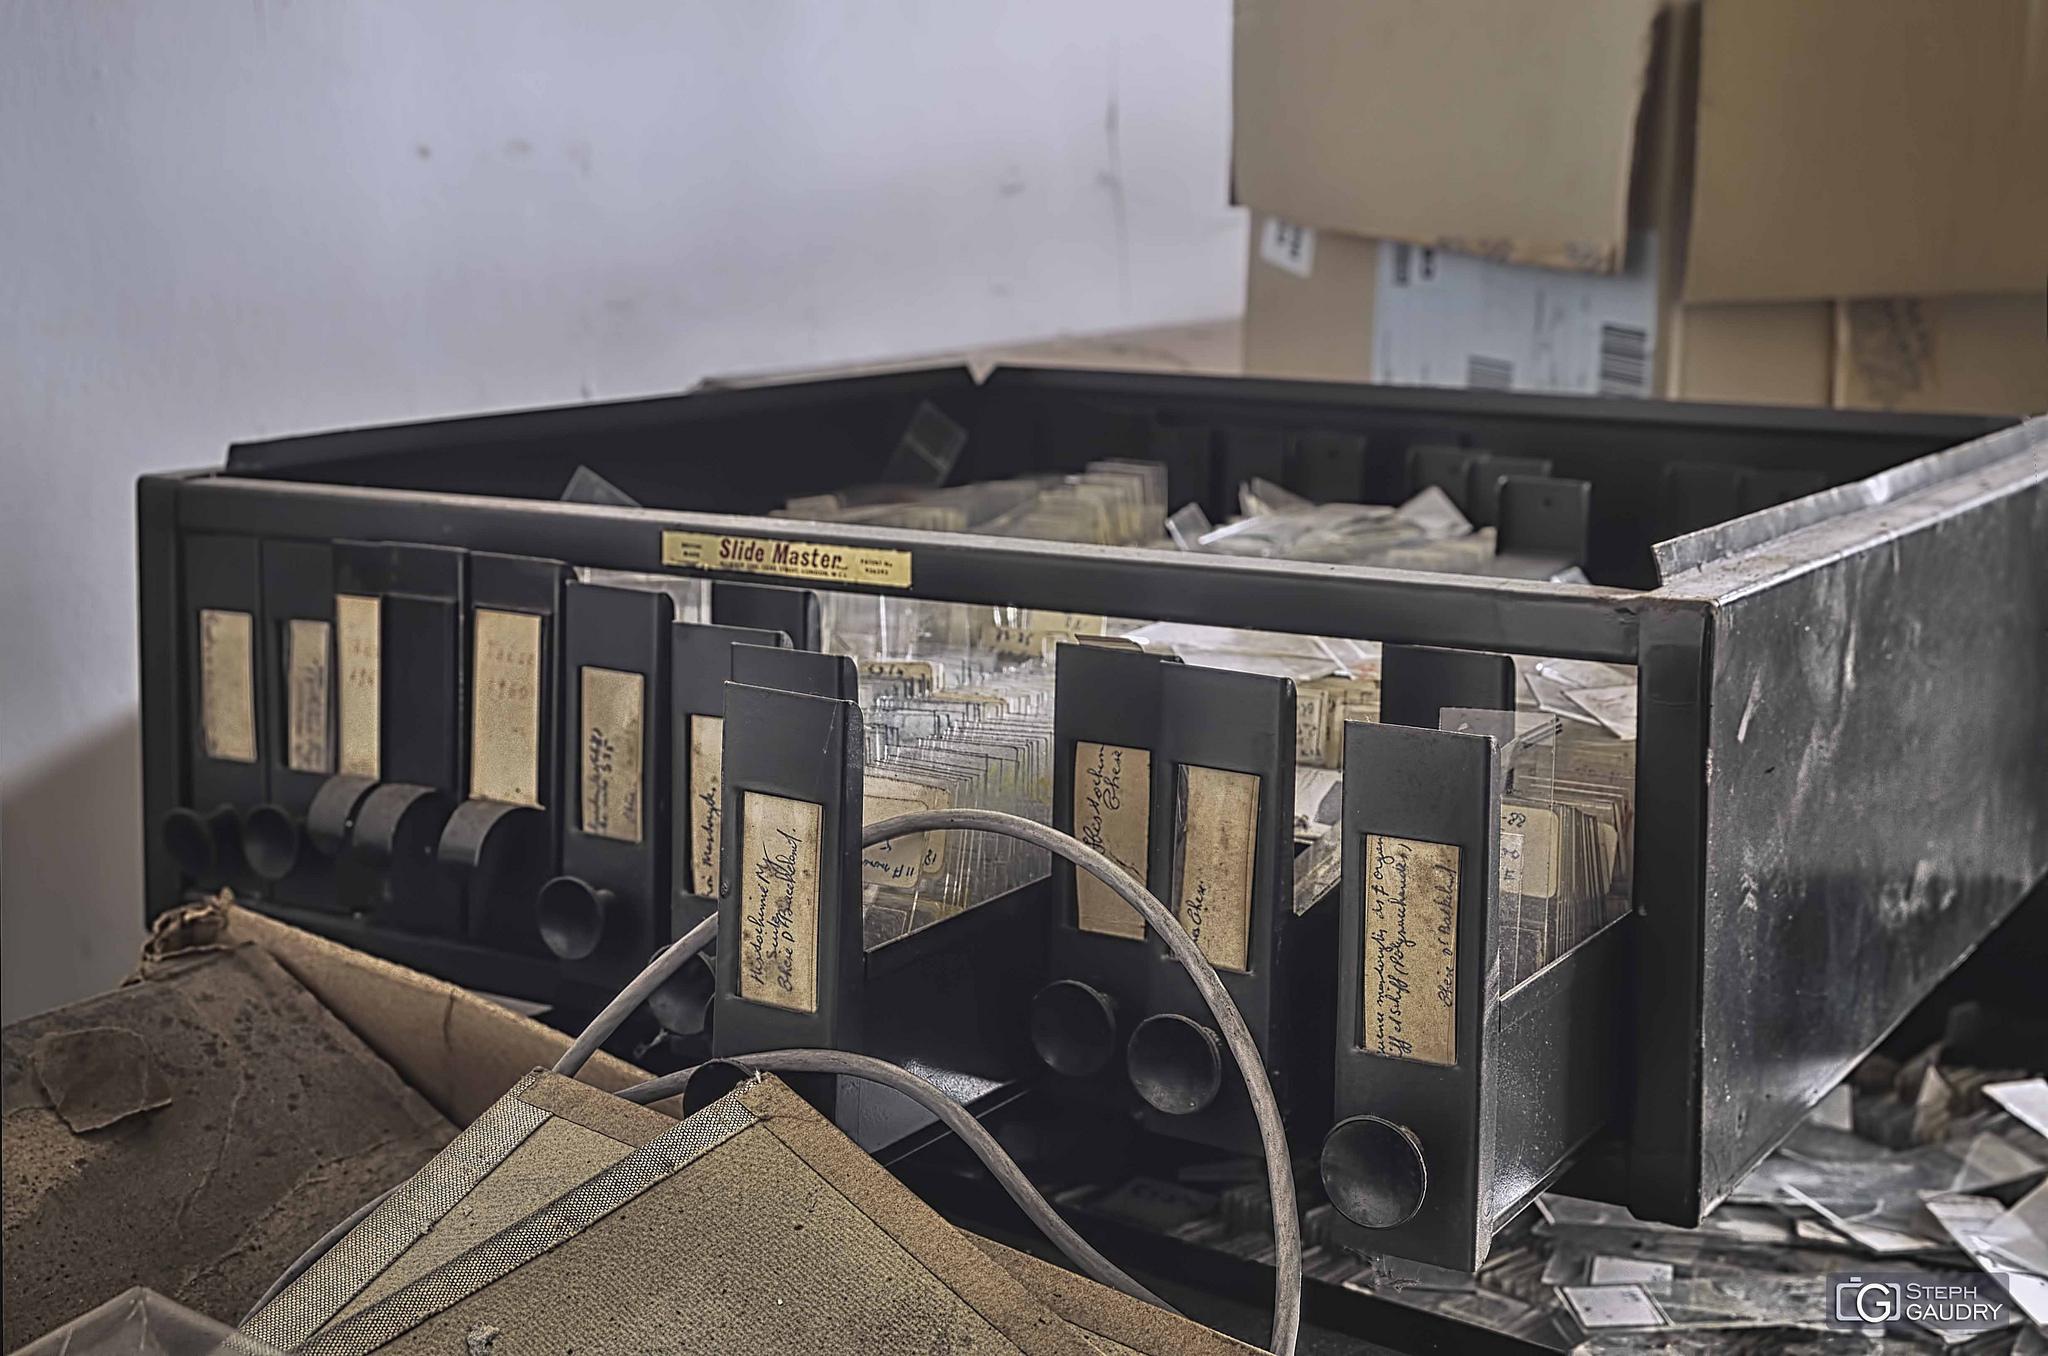 Slides boxes - samples - Histochimie [Klik om de diavoorstelling te starten]